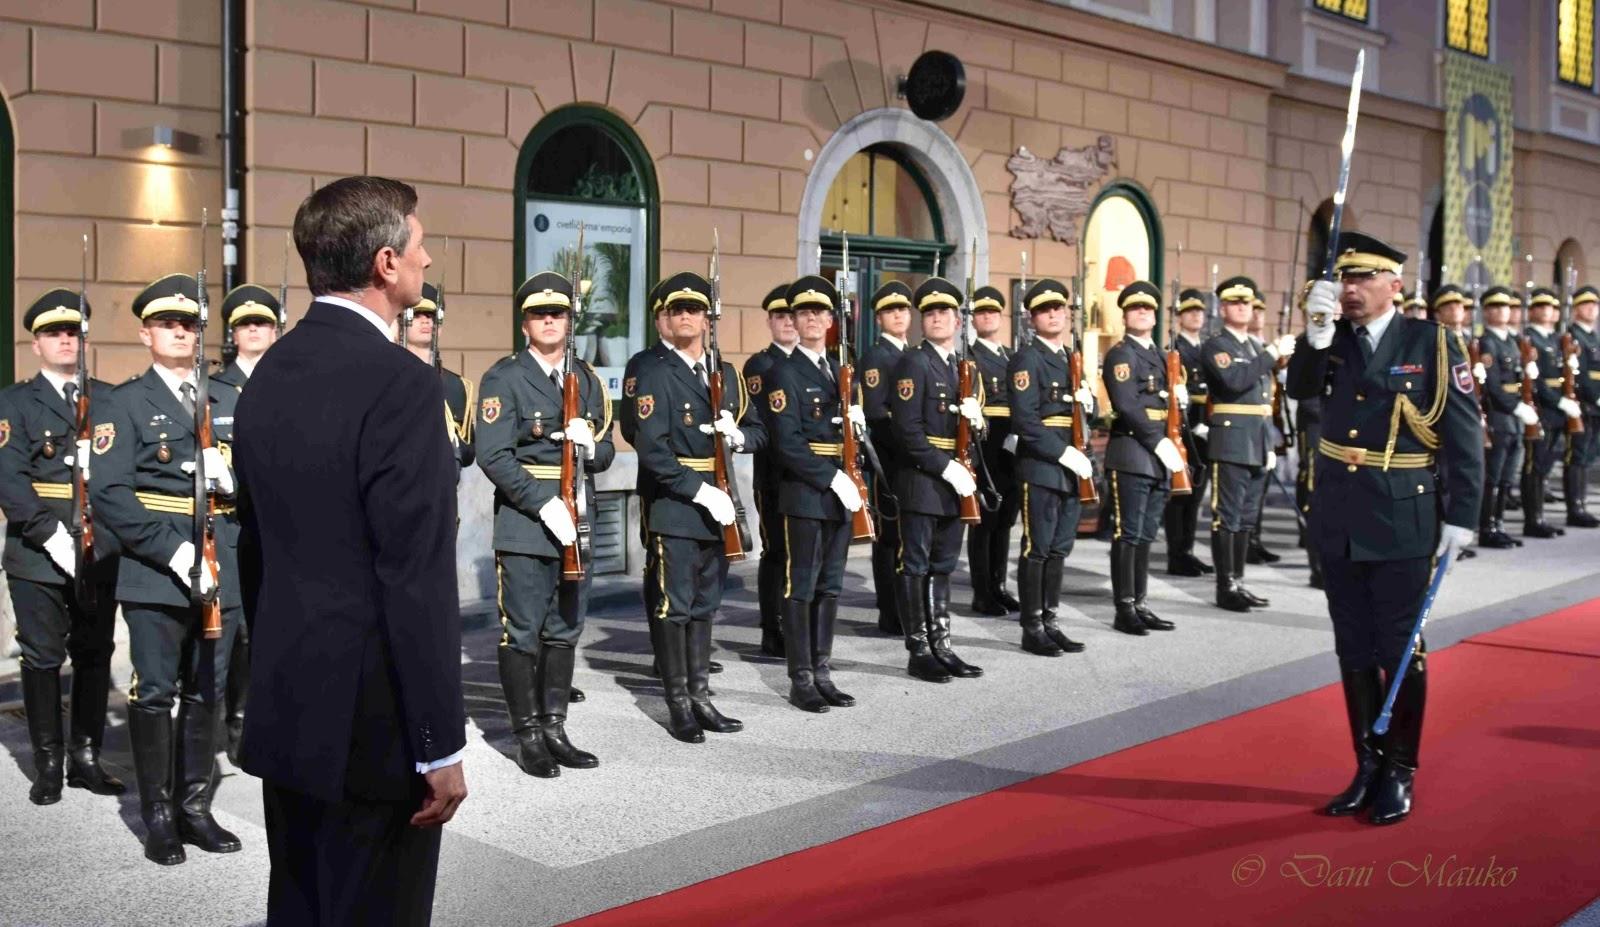 Državna proslava ob dnevu državnosti v Ljubljani - foto Dani Mauko